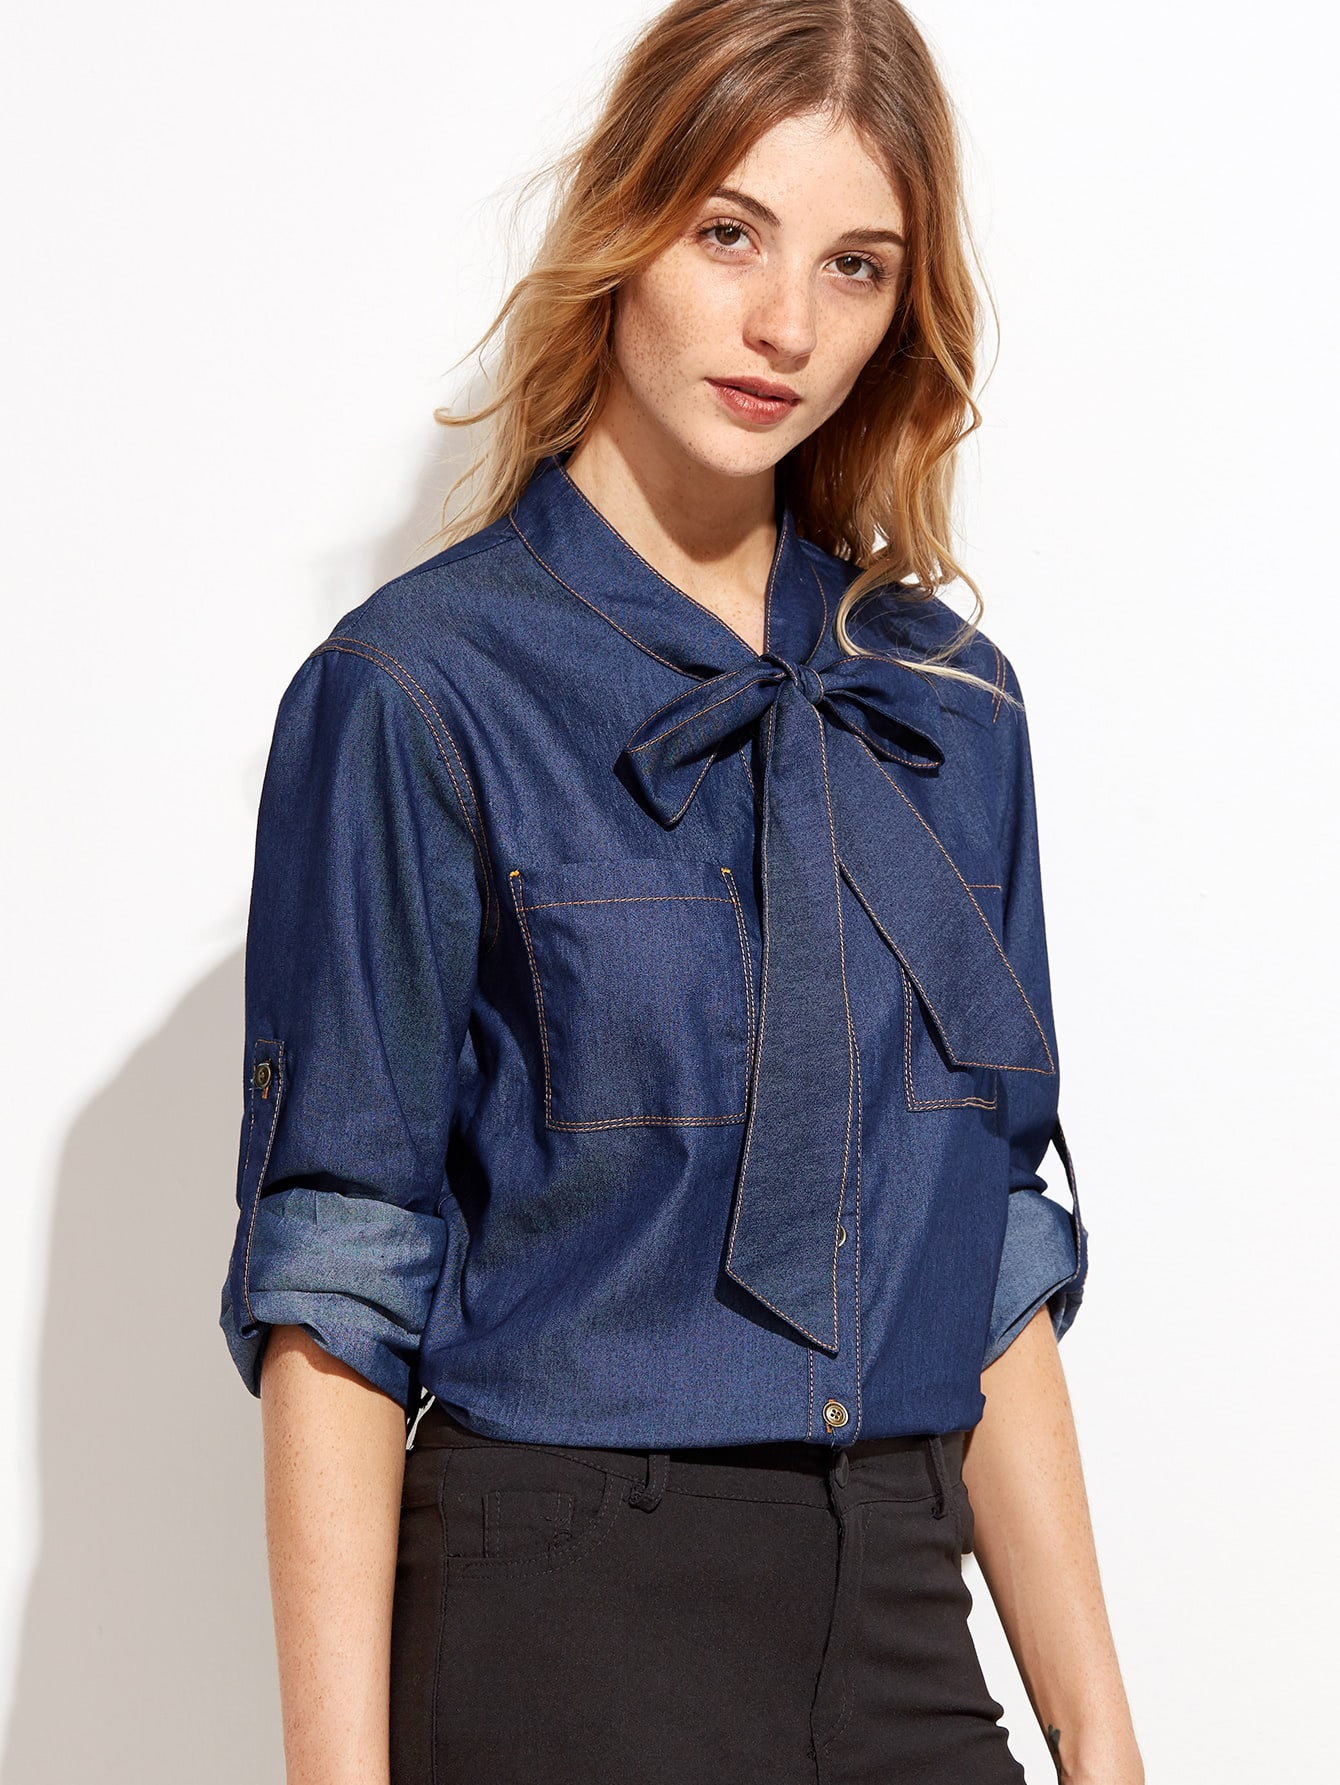 blouse160922502_2